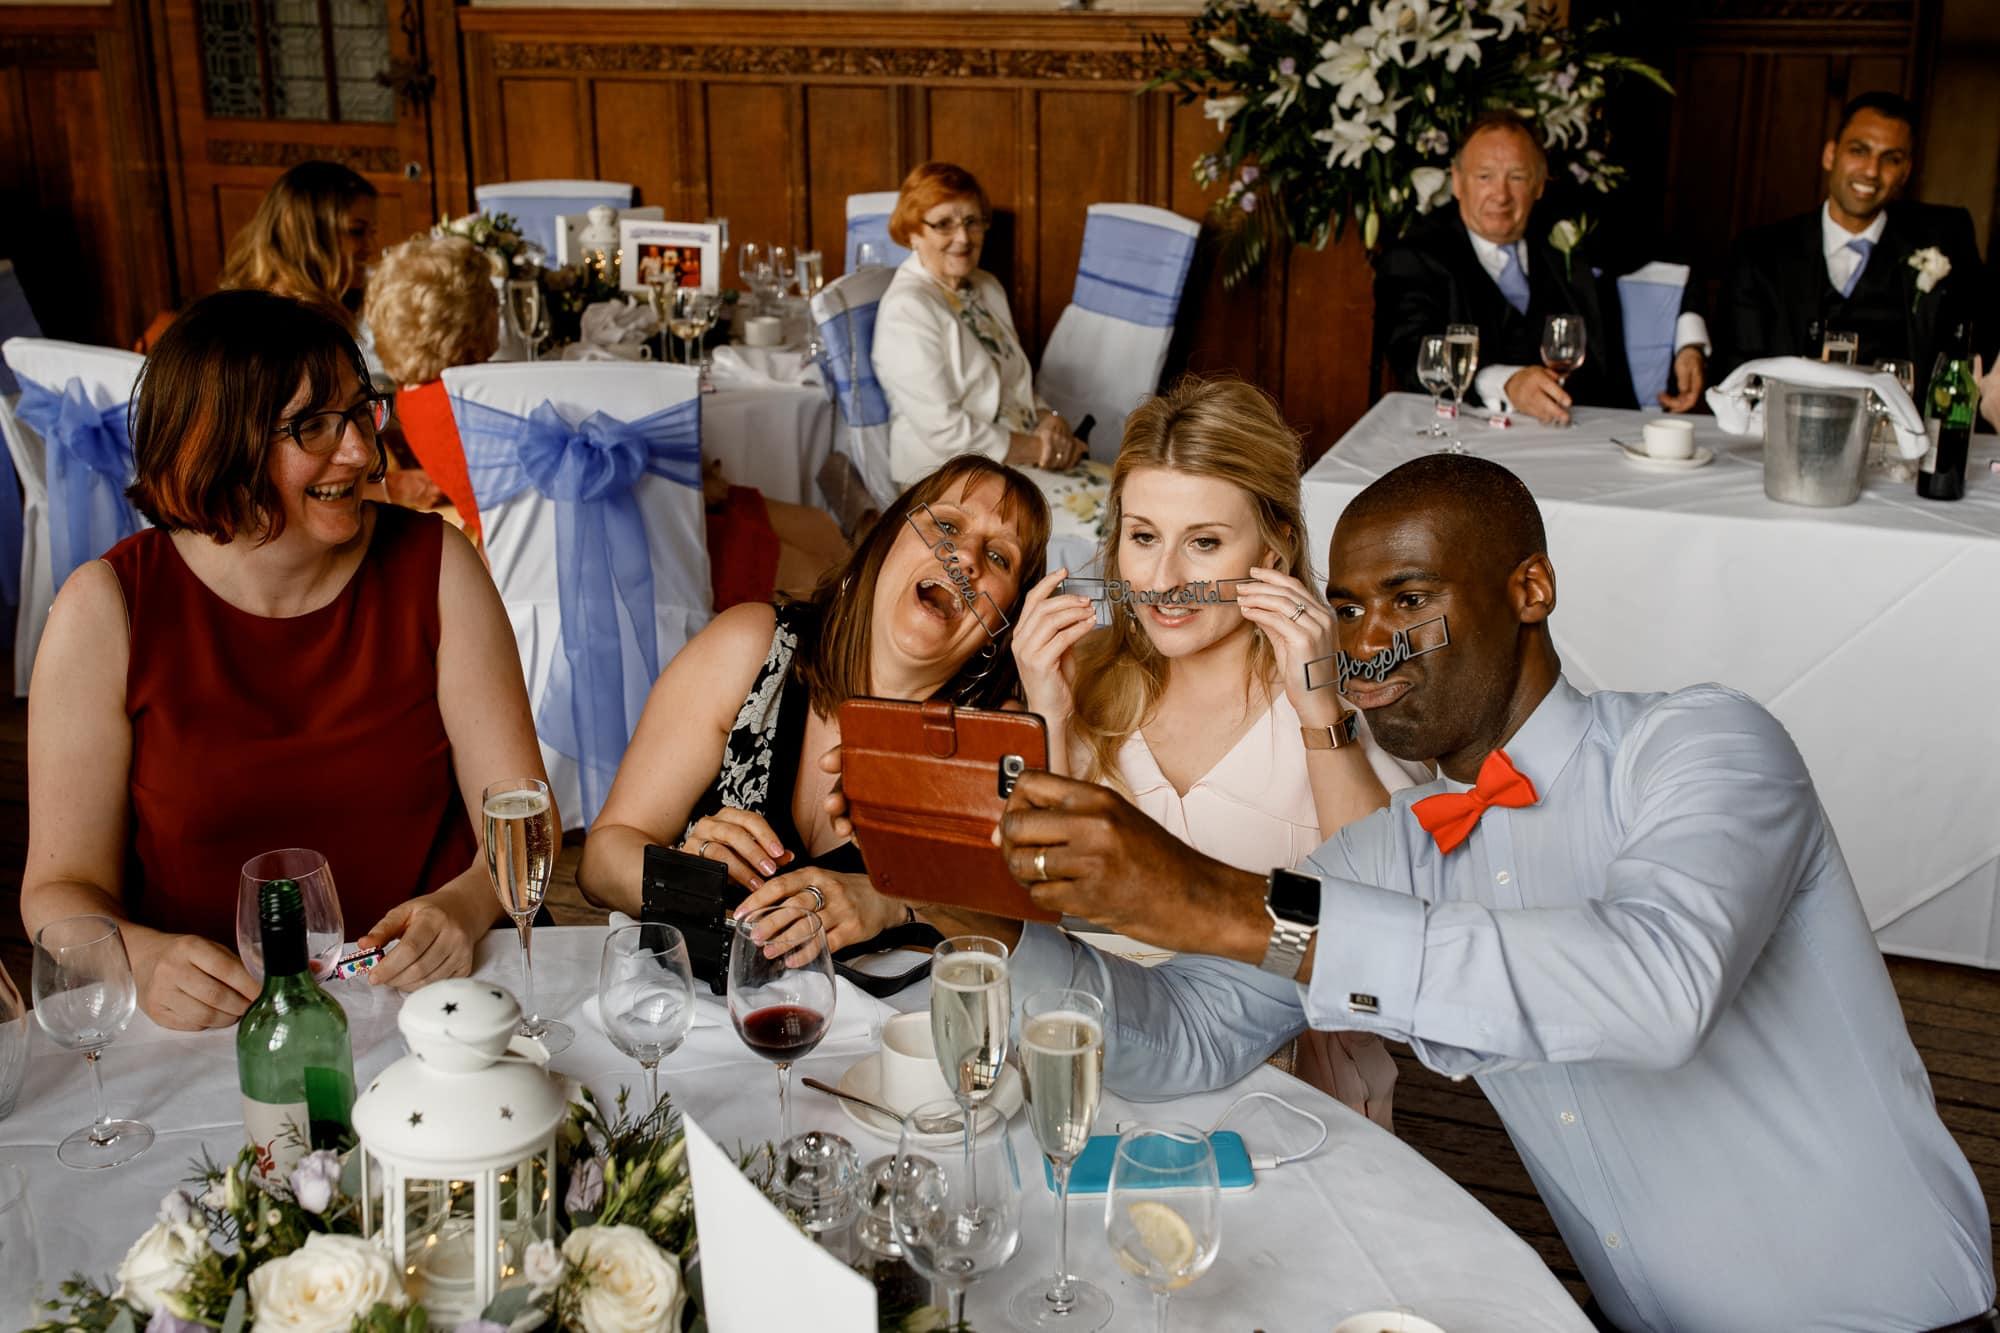 guests taking selfies at wedding